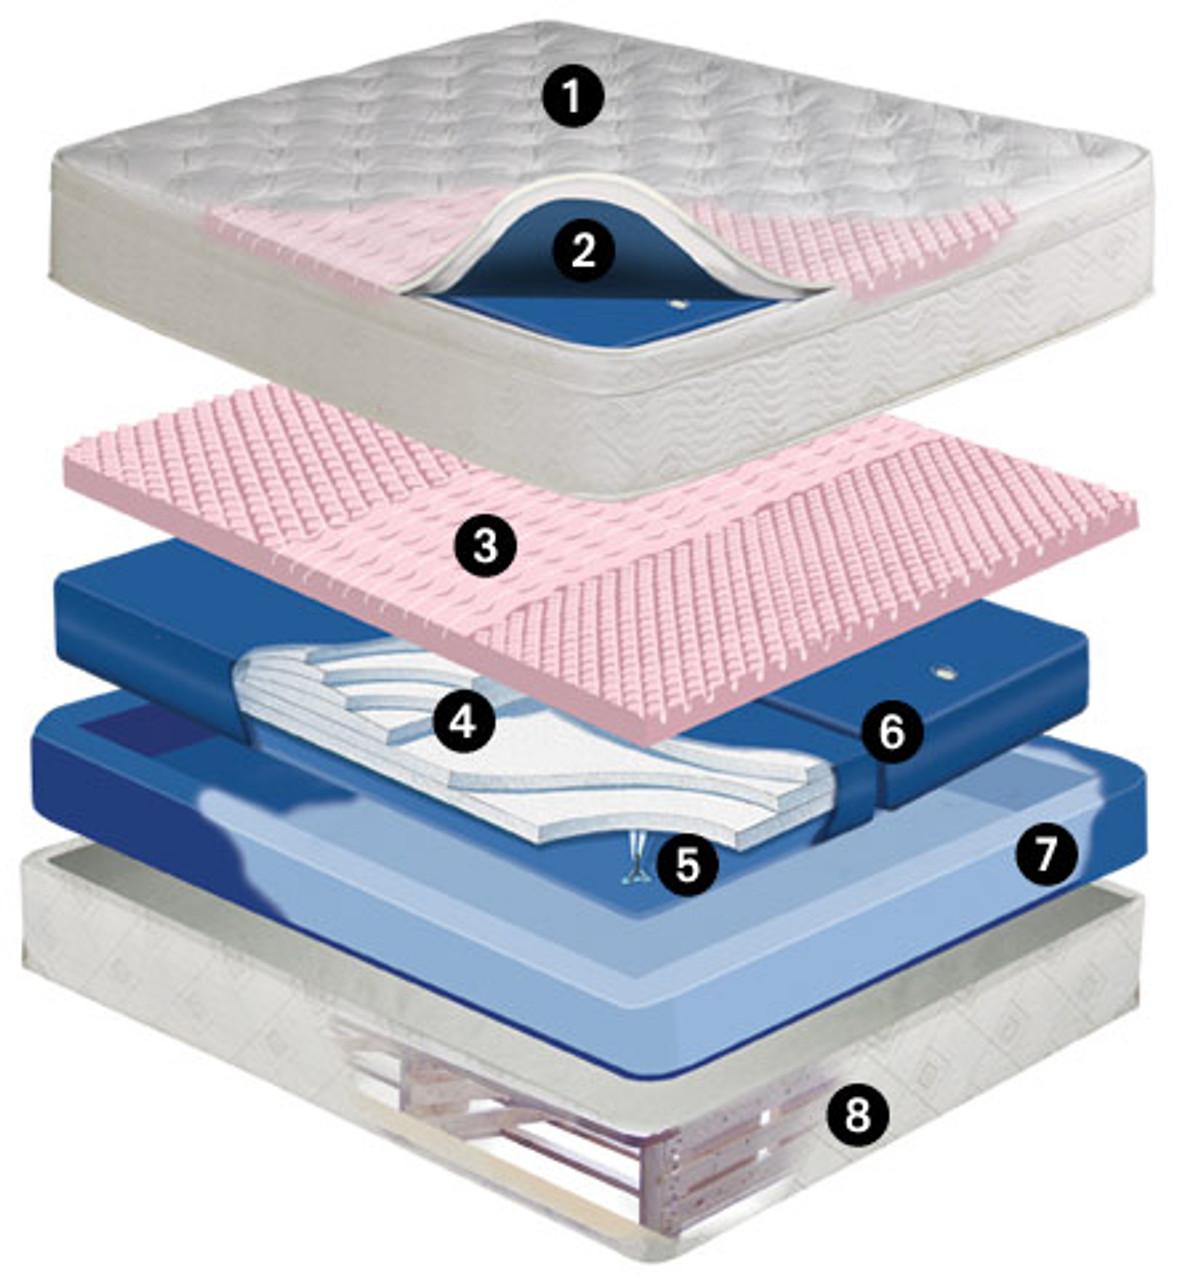 Dreamscape Mid Fill 11 inch softside waterbed mattress Dual Chamber Waveless Mattress